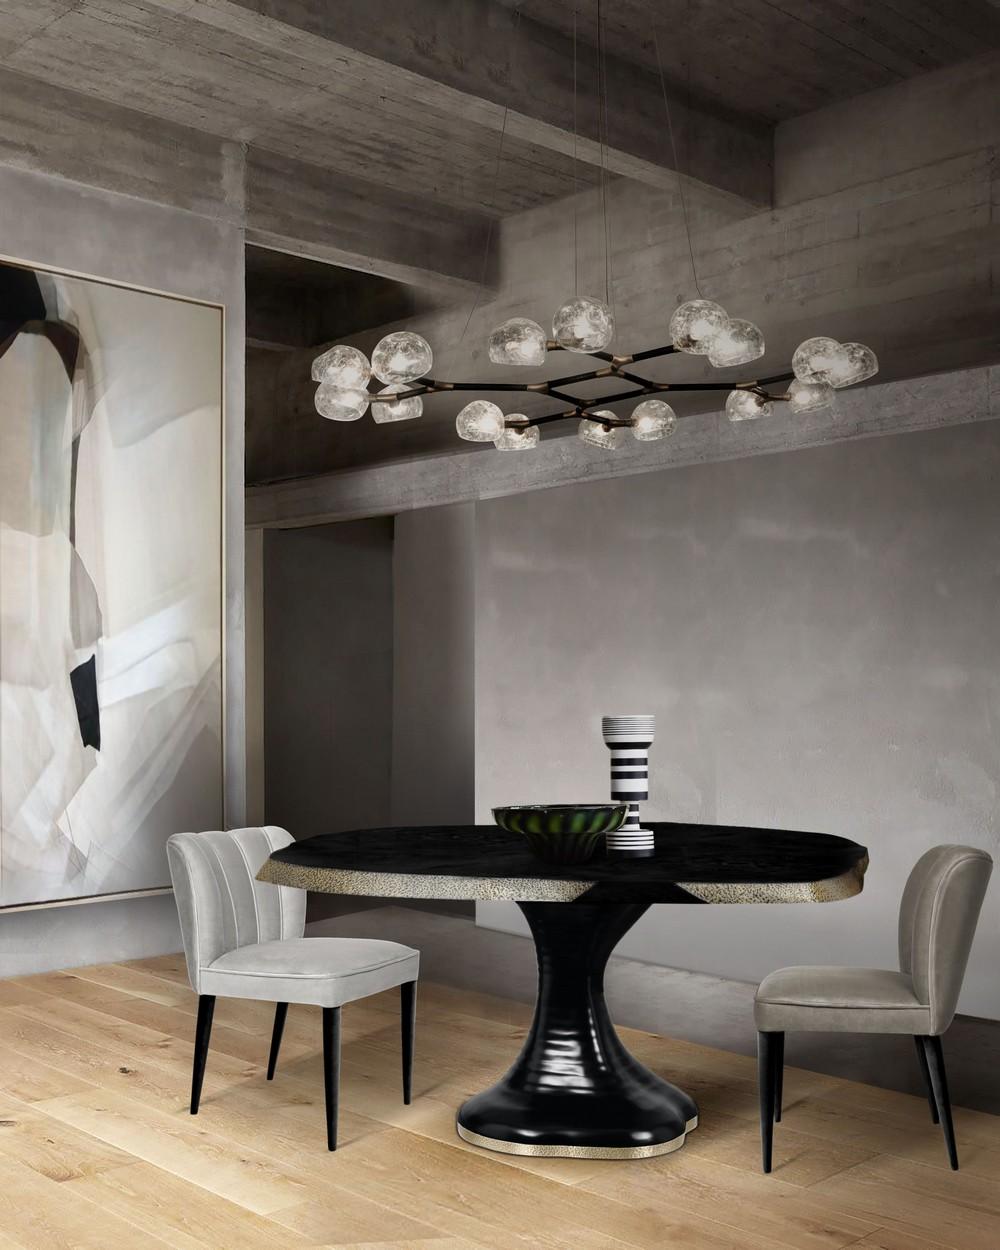 Luxury Lighting: Dining Room Ideas From Mid-century To Contemporary dining room Luxury Lighting: Dining Room Ideas From Mid-century To Contemporary Ts6Etzsw